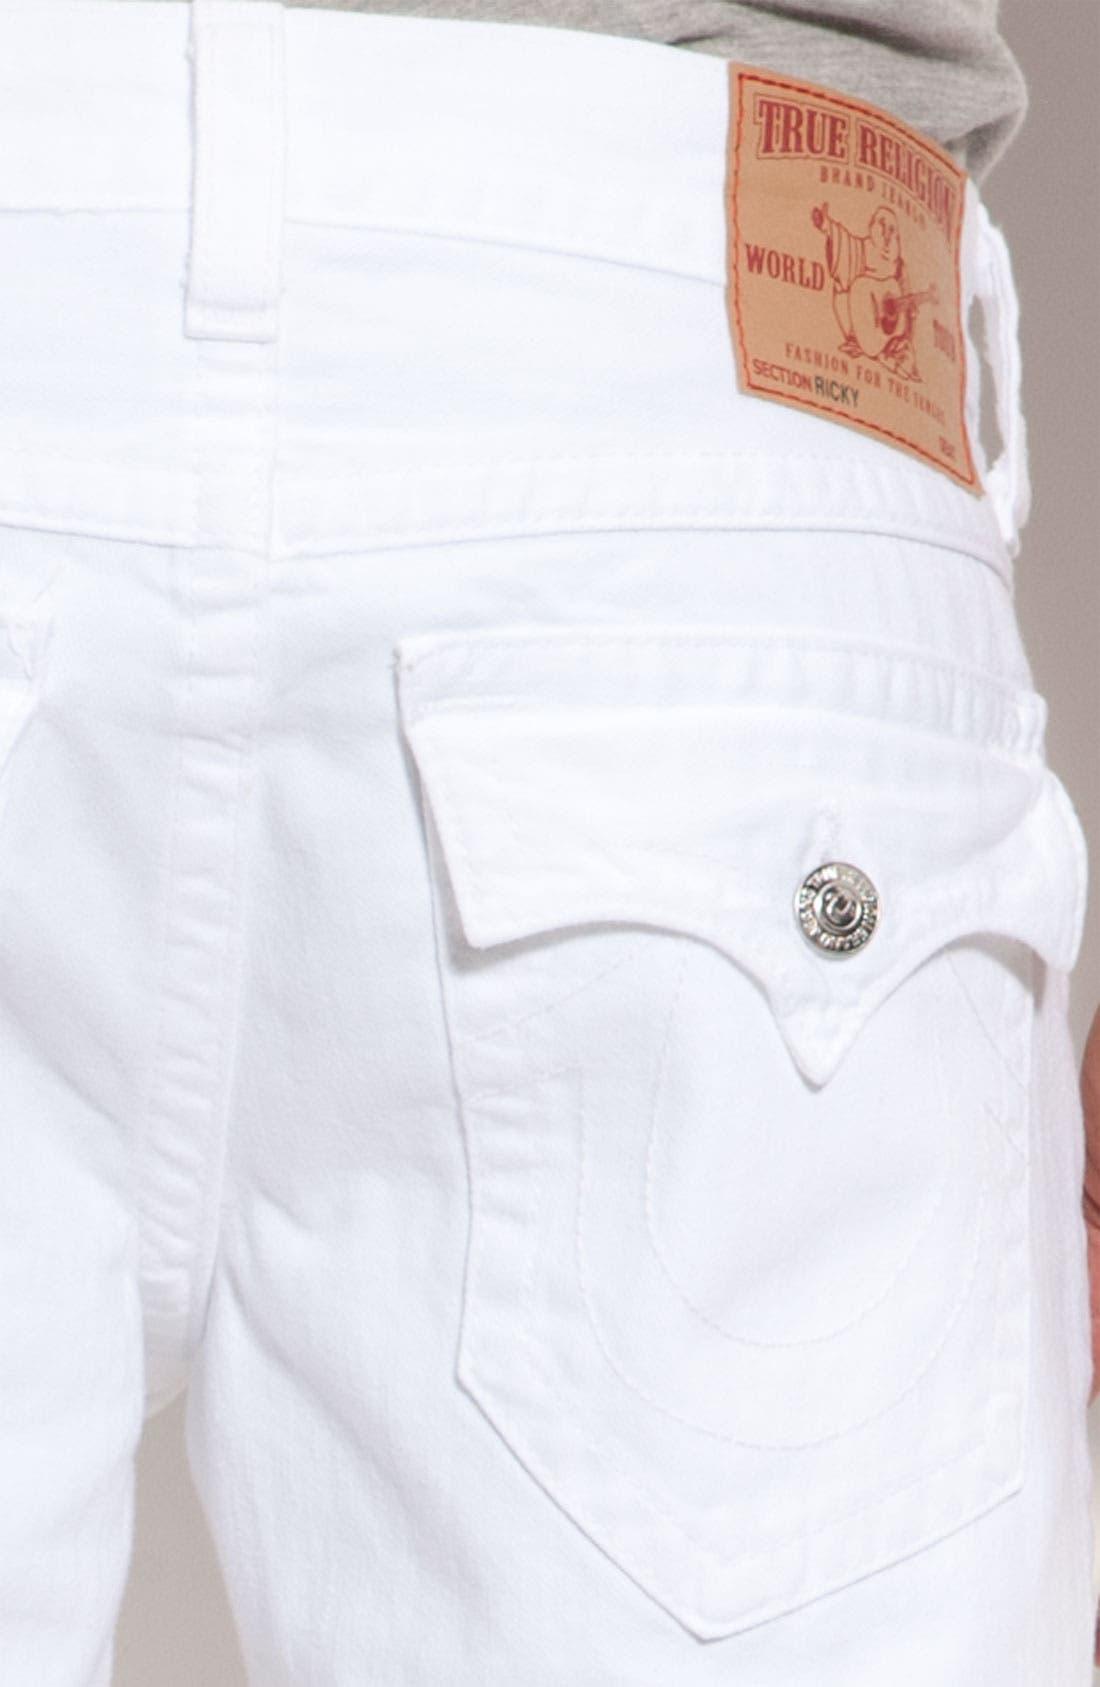 Alternate Image 4  - True Religion Brand Jeans 'Ricky' Relaxed Straight Leg Jeans (Optic Rinse)